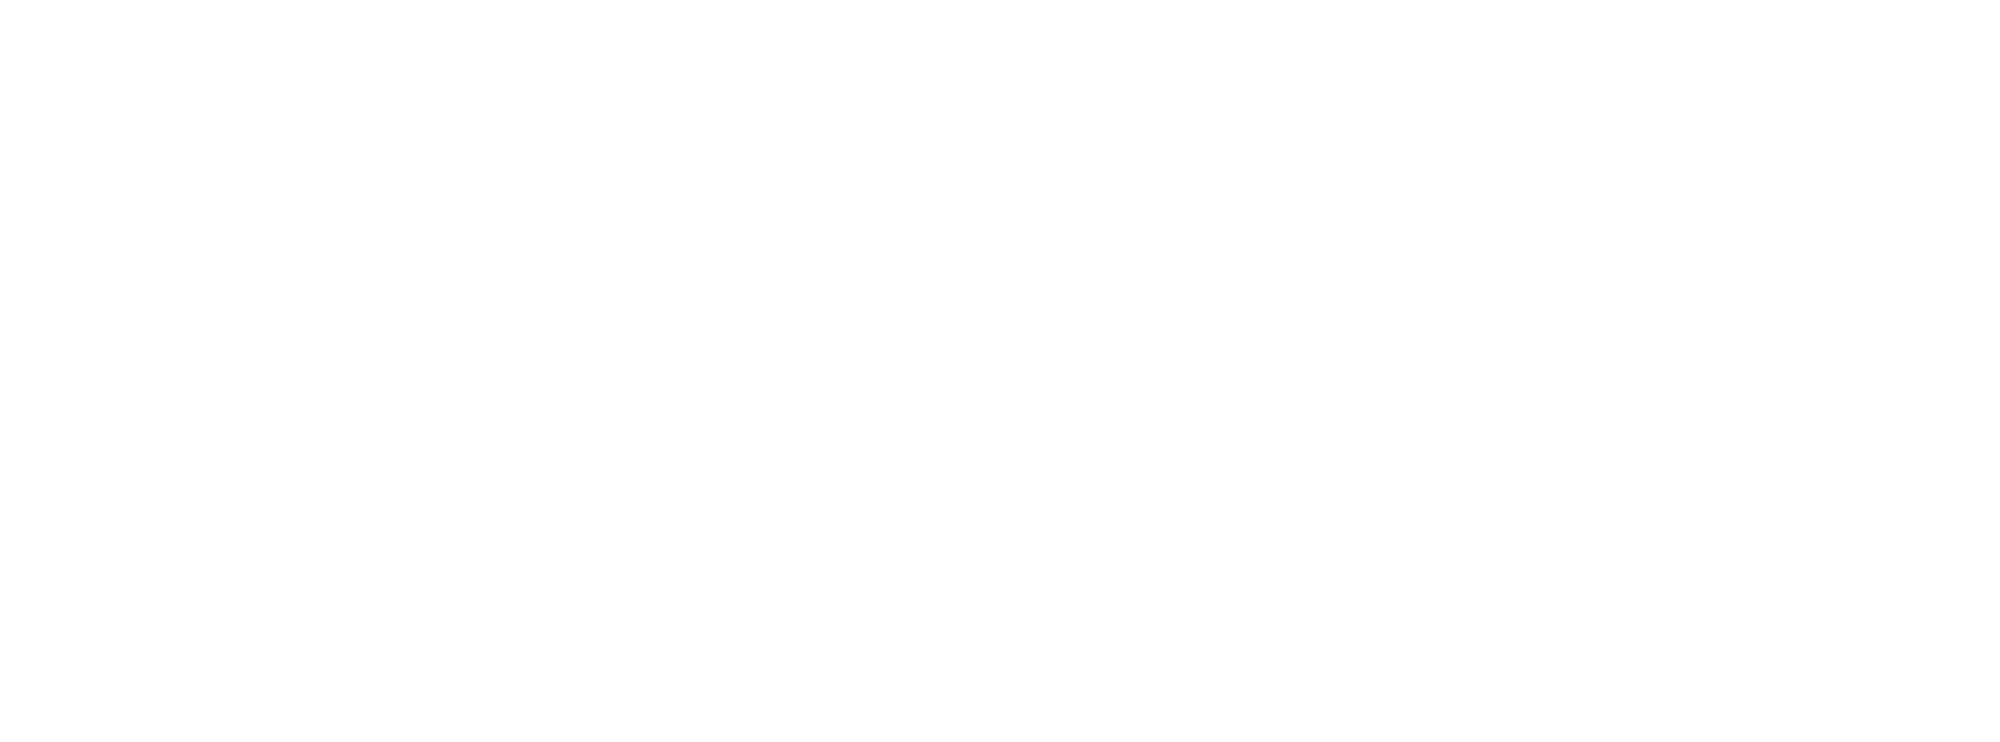 Greenvale Guitar School-logo-white.png